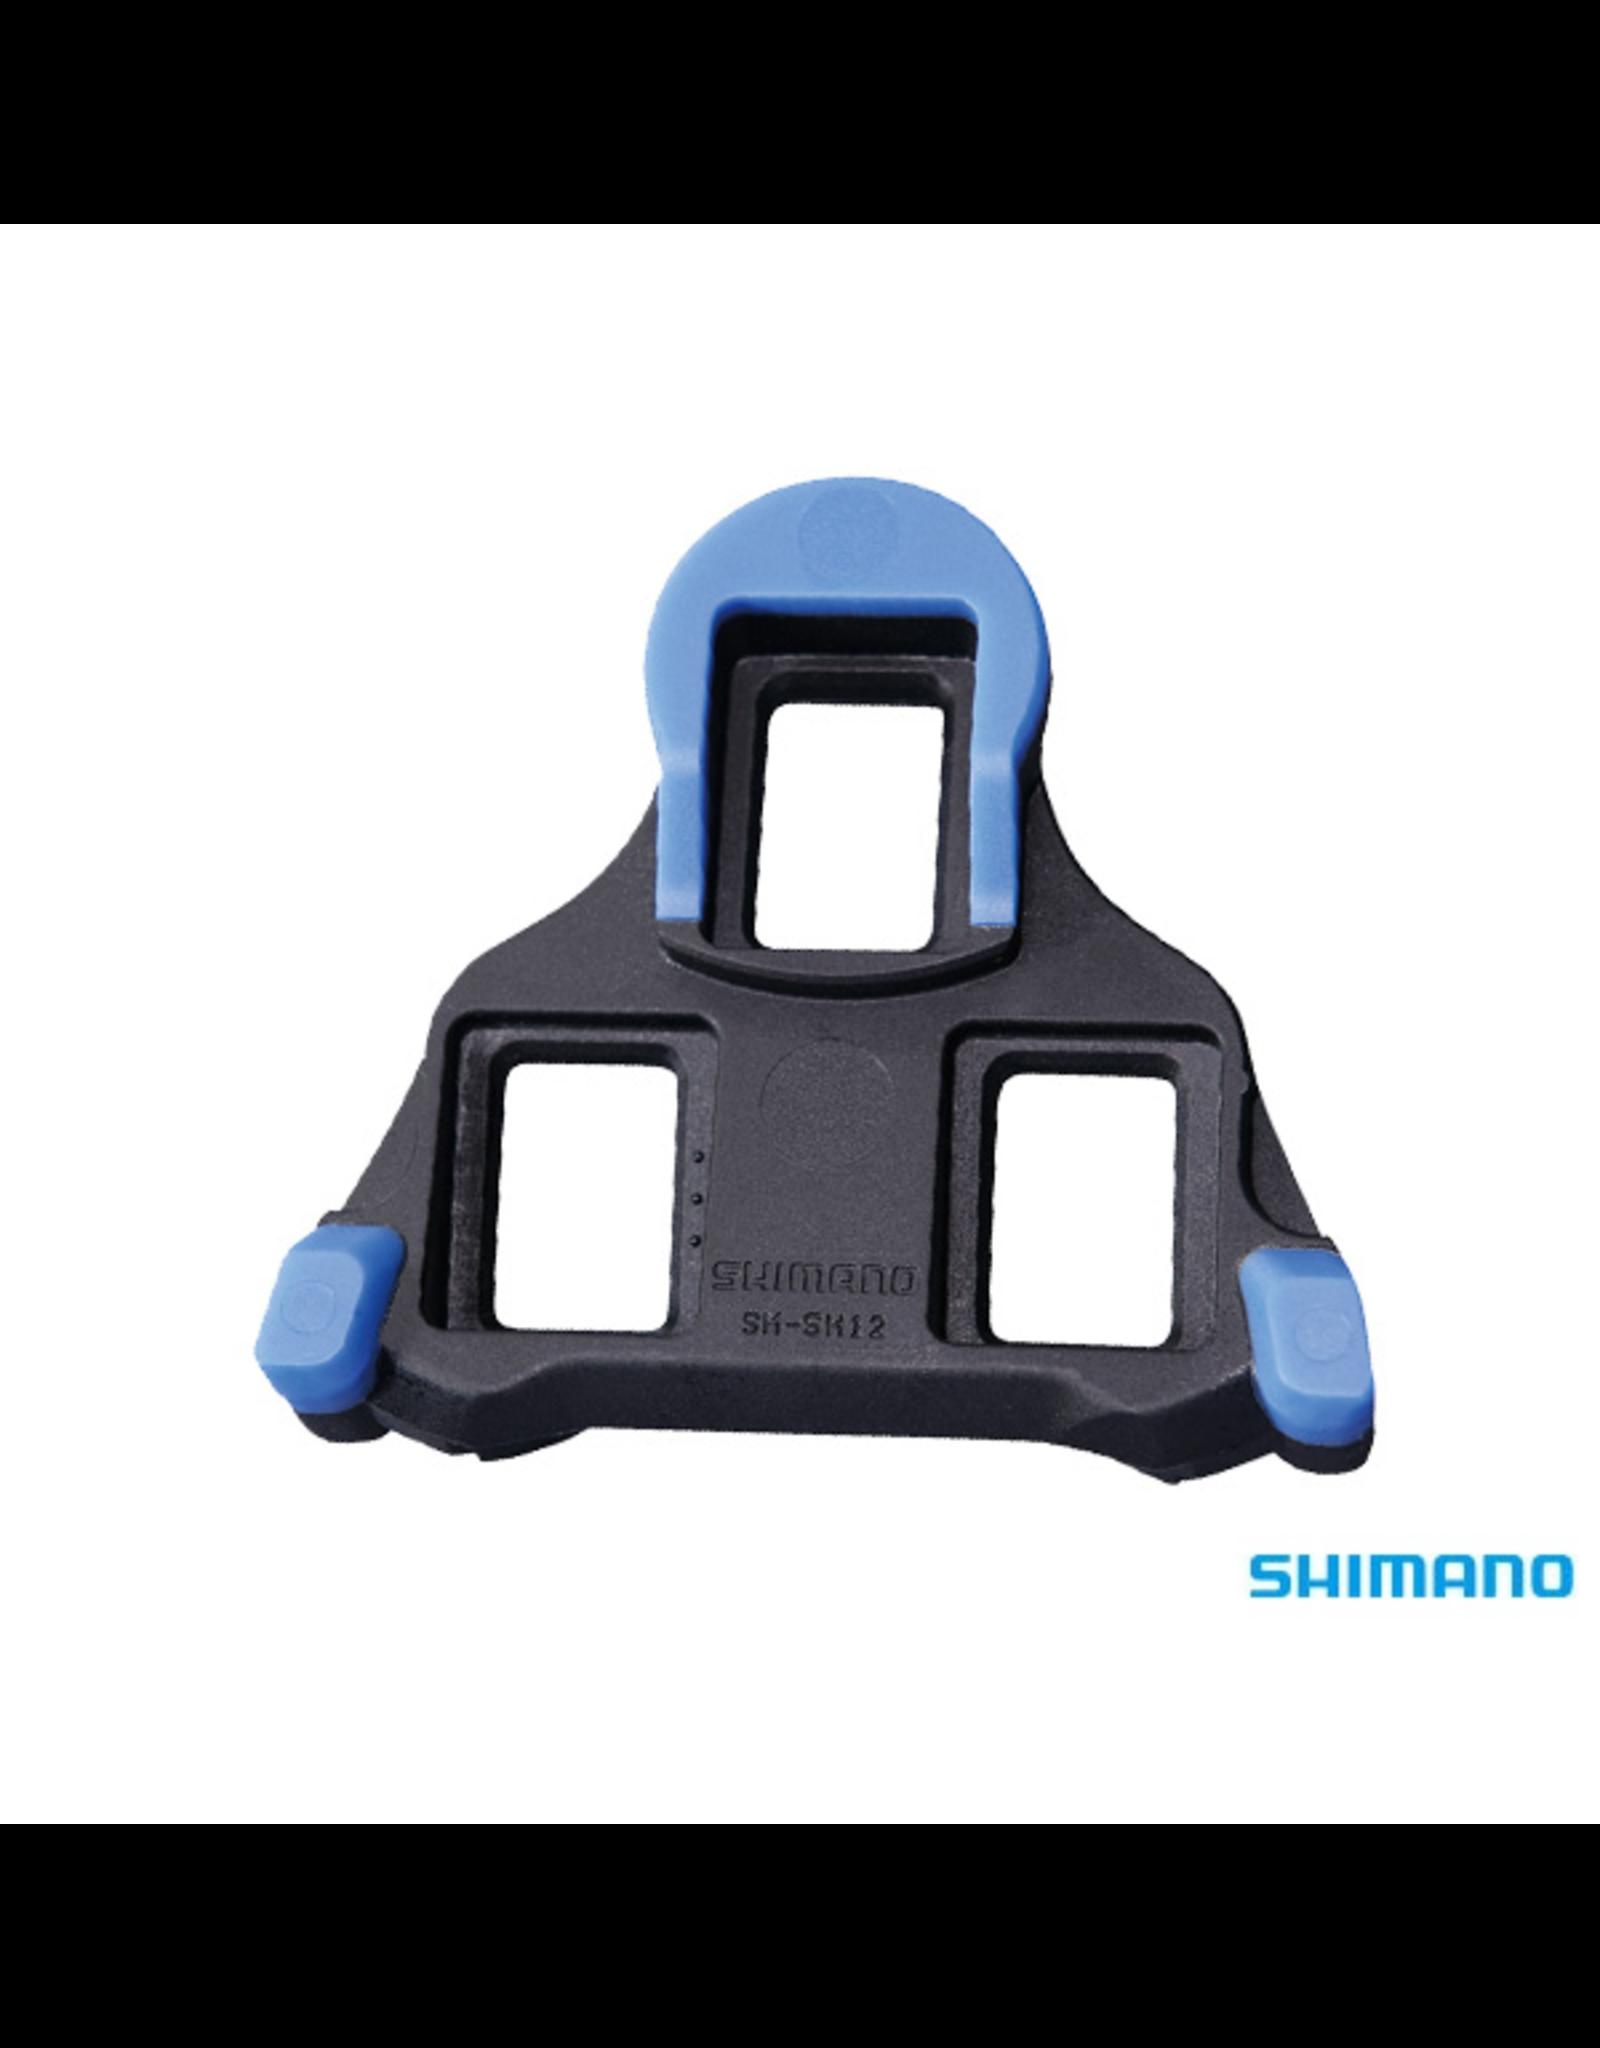 Shimano SHIMANO SM-SH12 SPD-SL BLUE PEDAL CLEAT SET